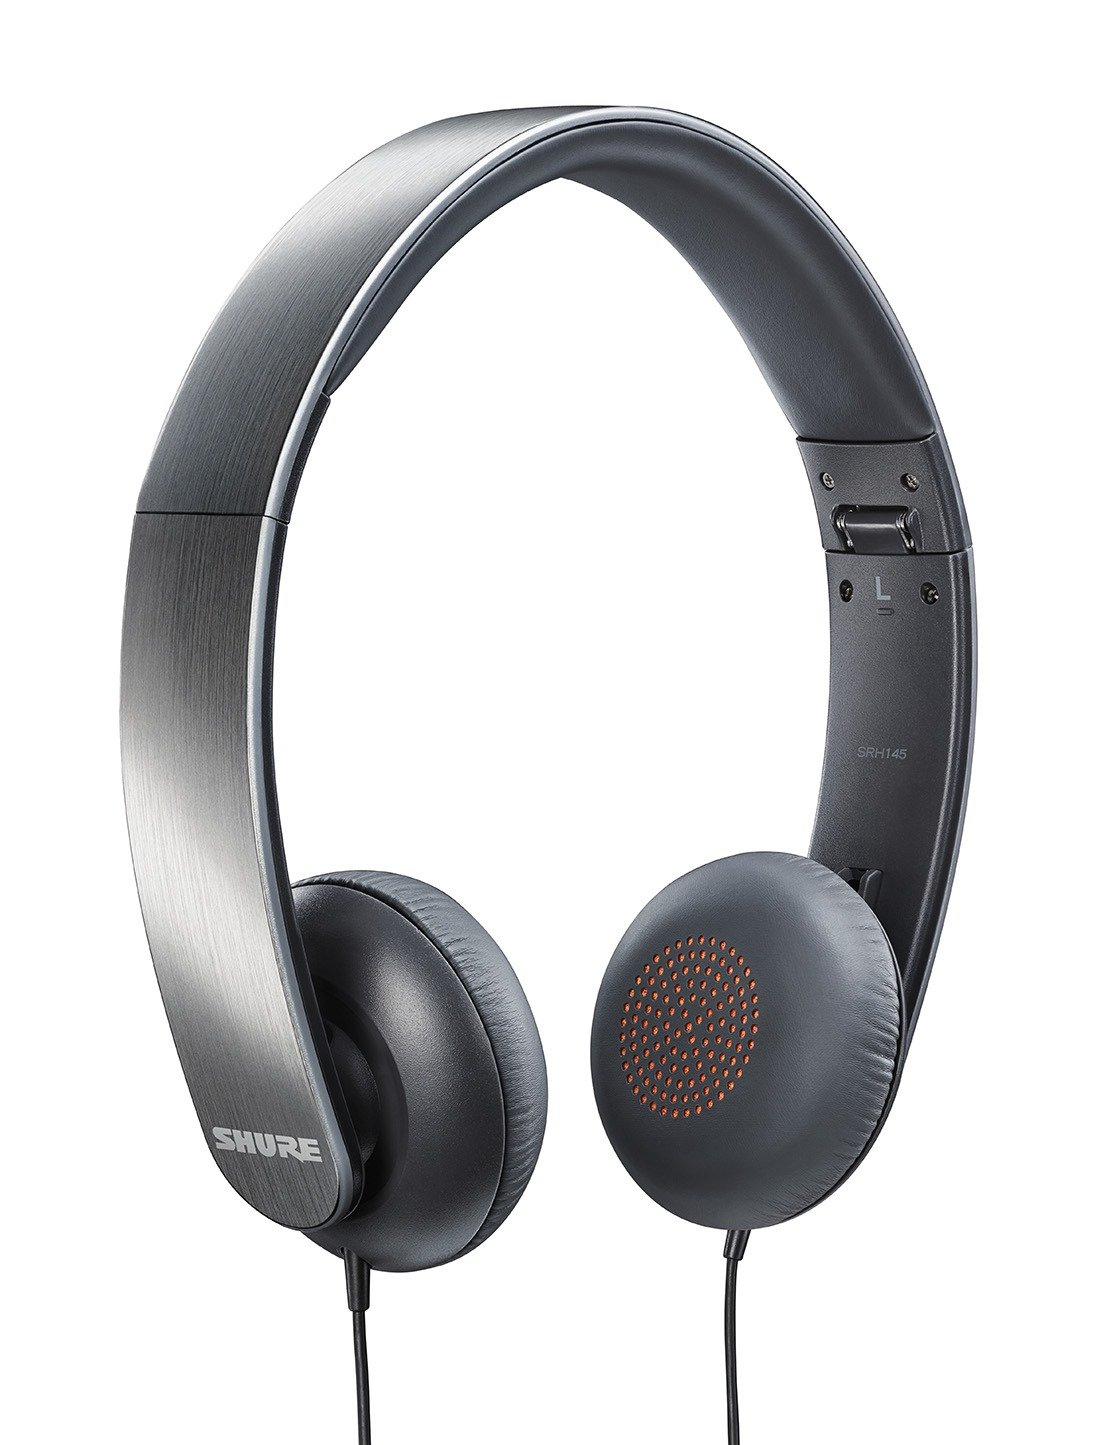 CDM product Shure SRH145 Semi-Open Portable Collapsible Headphones big image